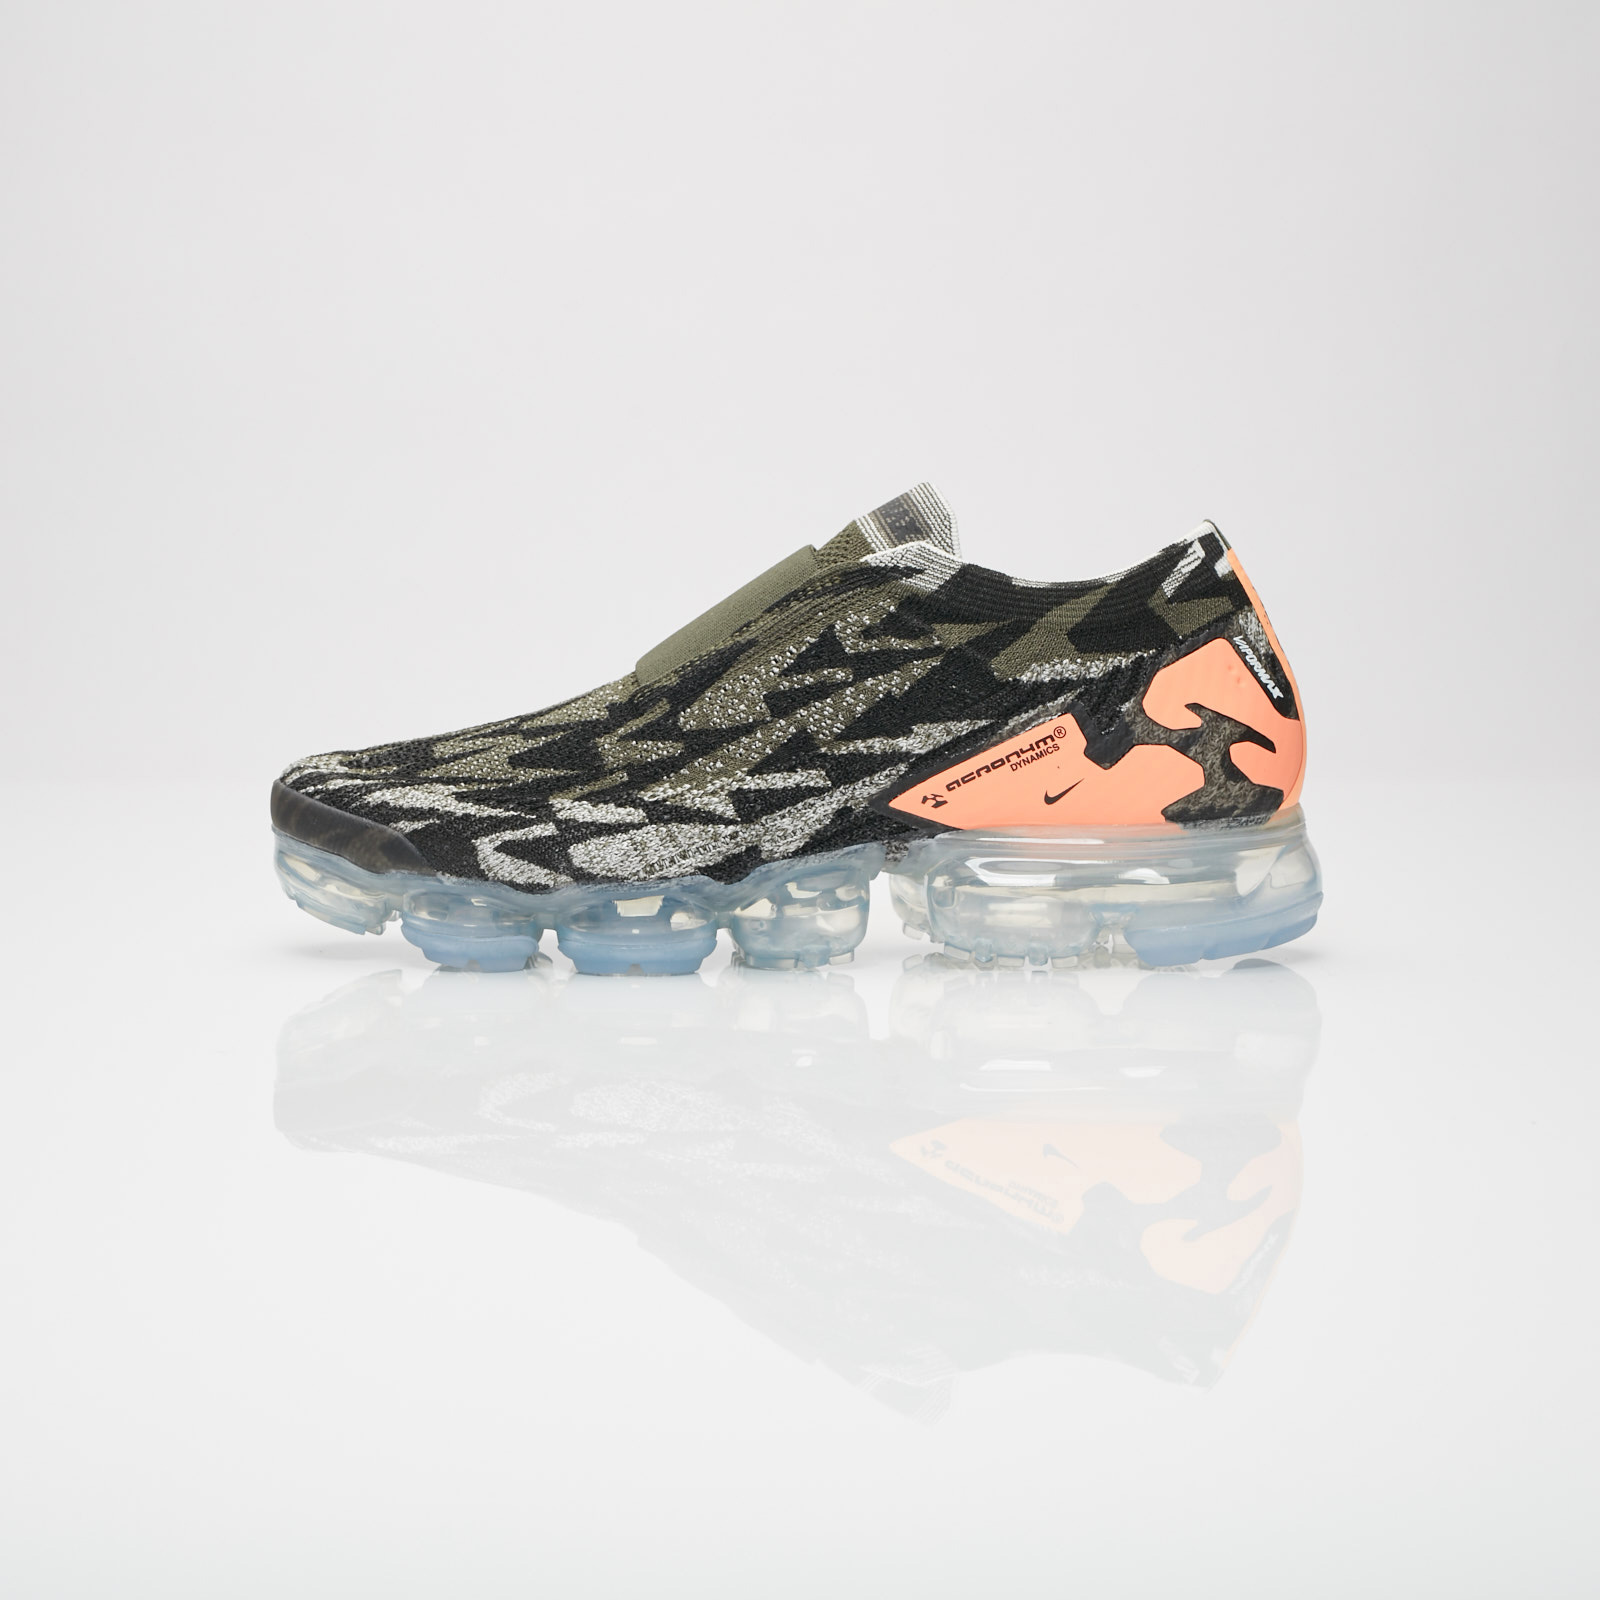 4818d3a486b Nike Air Vapormax FK Moc 2   Acronym - Aq0996-102 - Sneakersnstuff ...